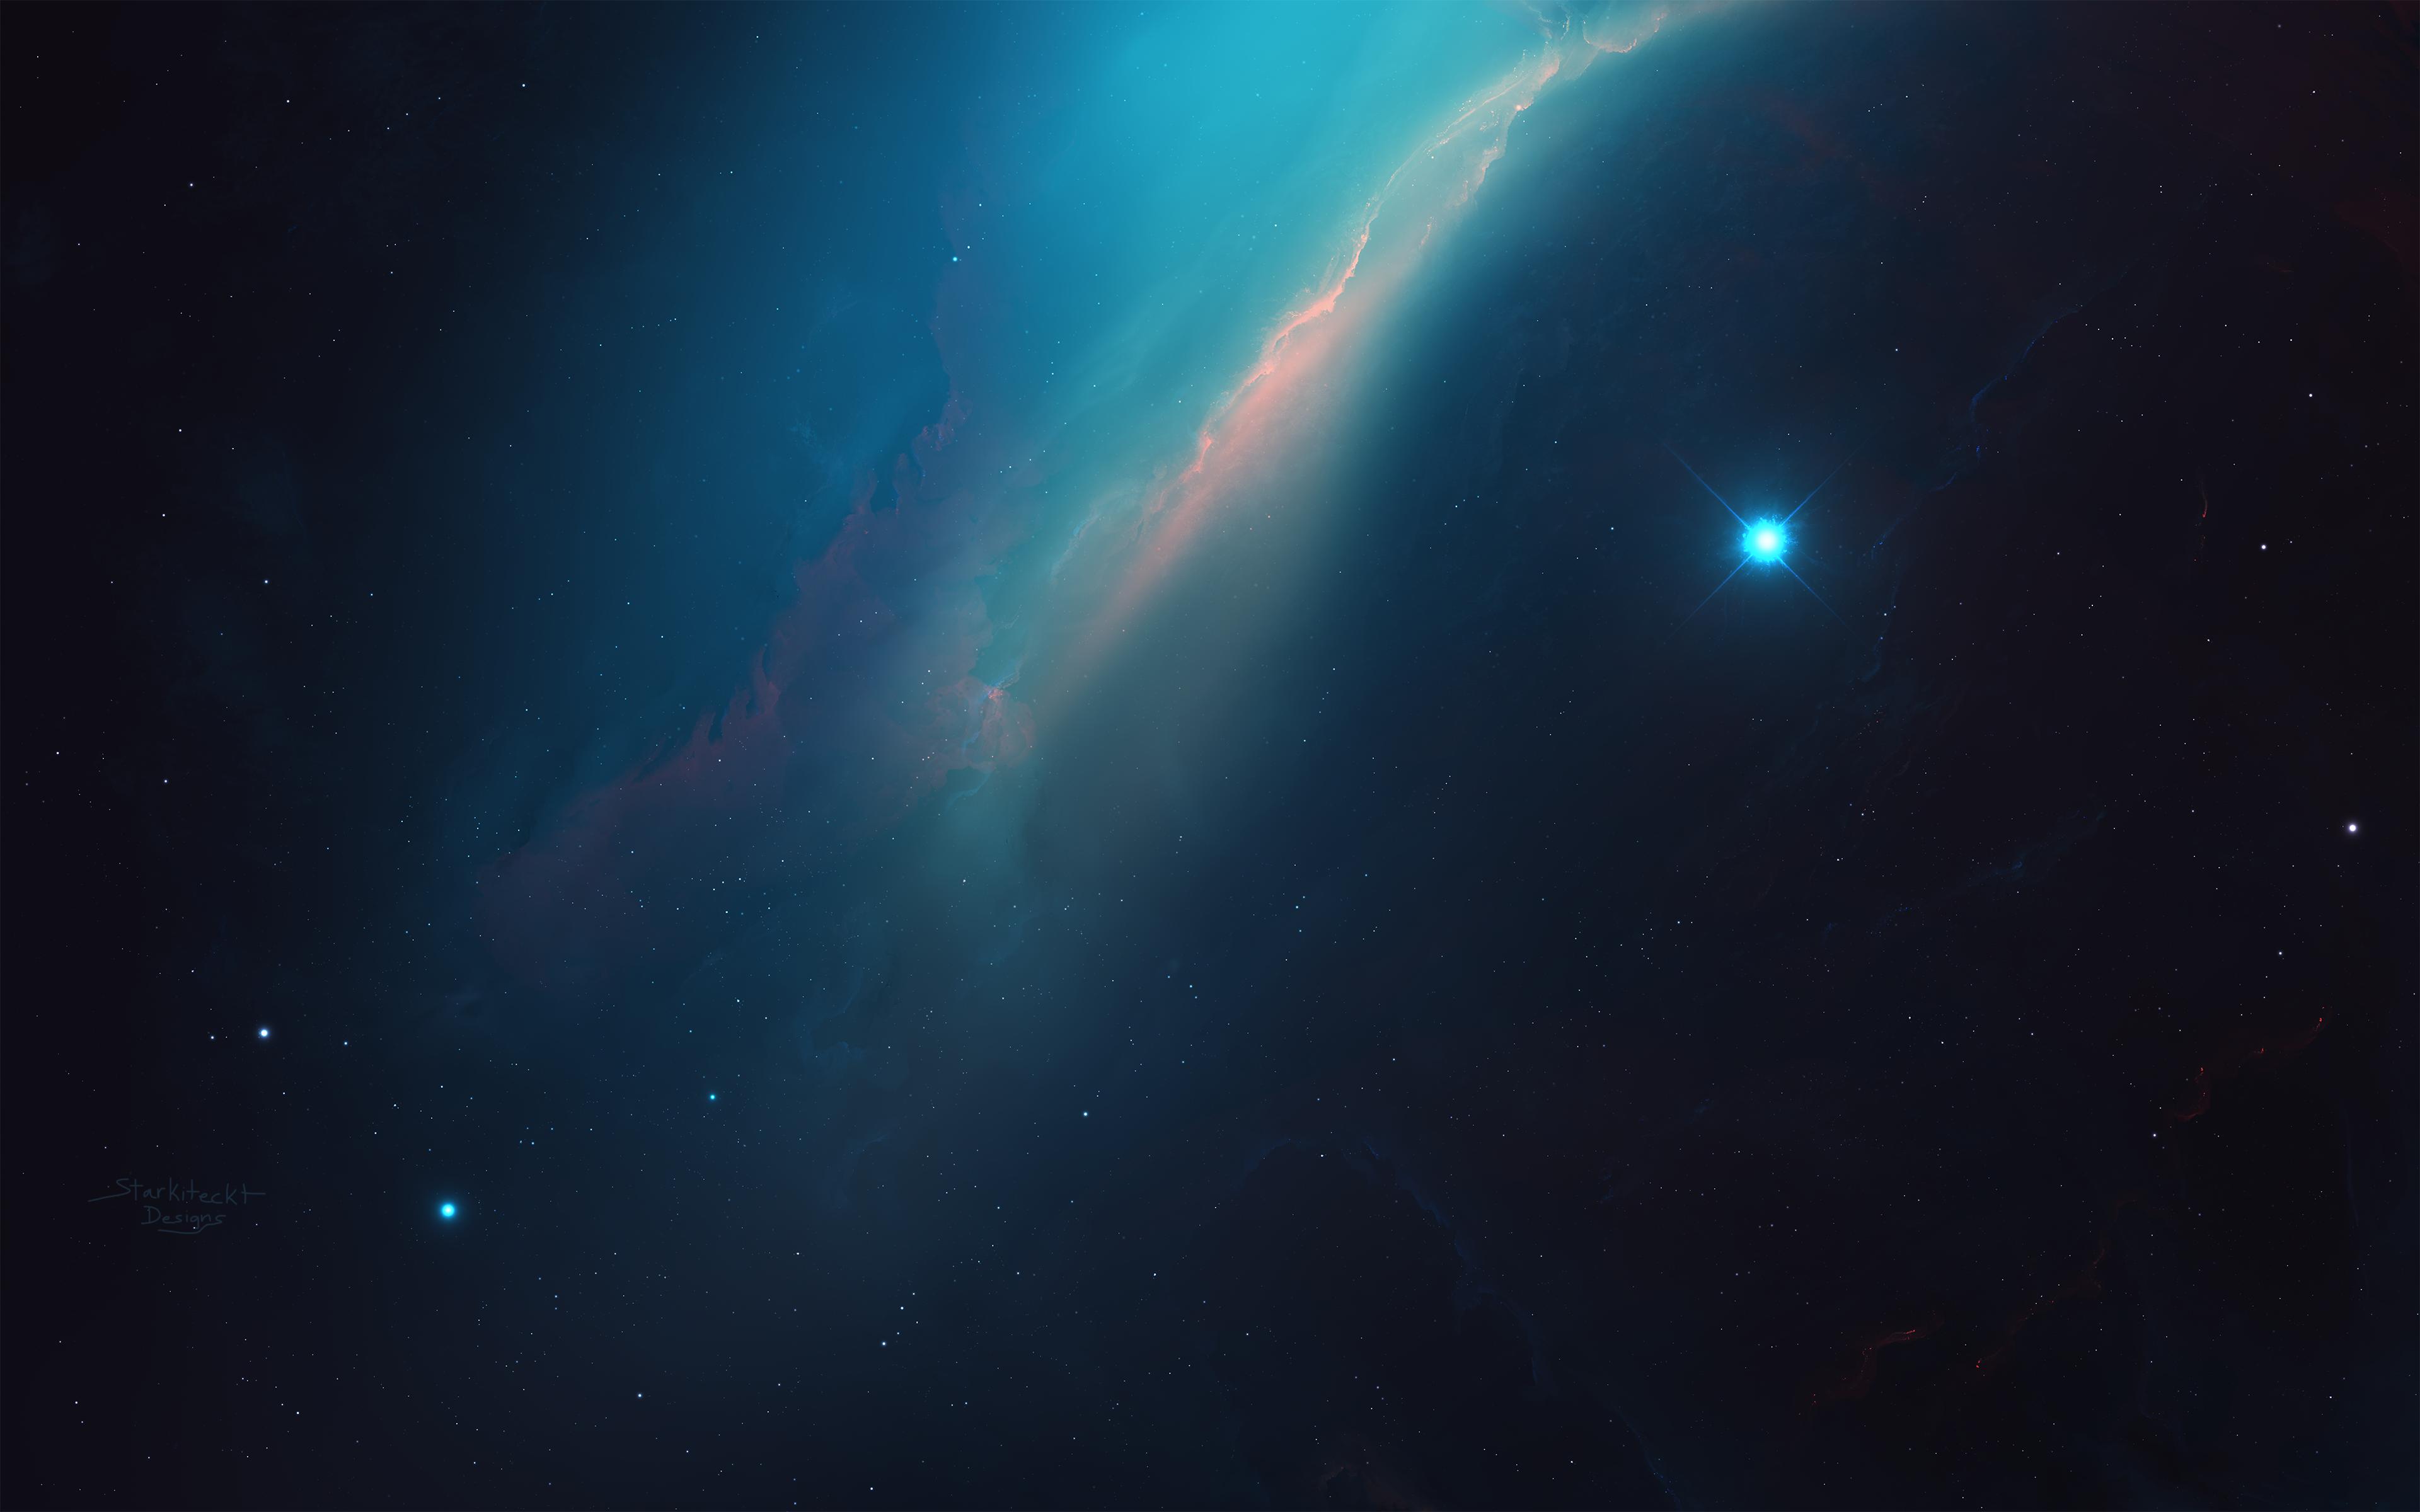 General 3840x2400 Starkiteckt space nebula 3D Abstract universe